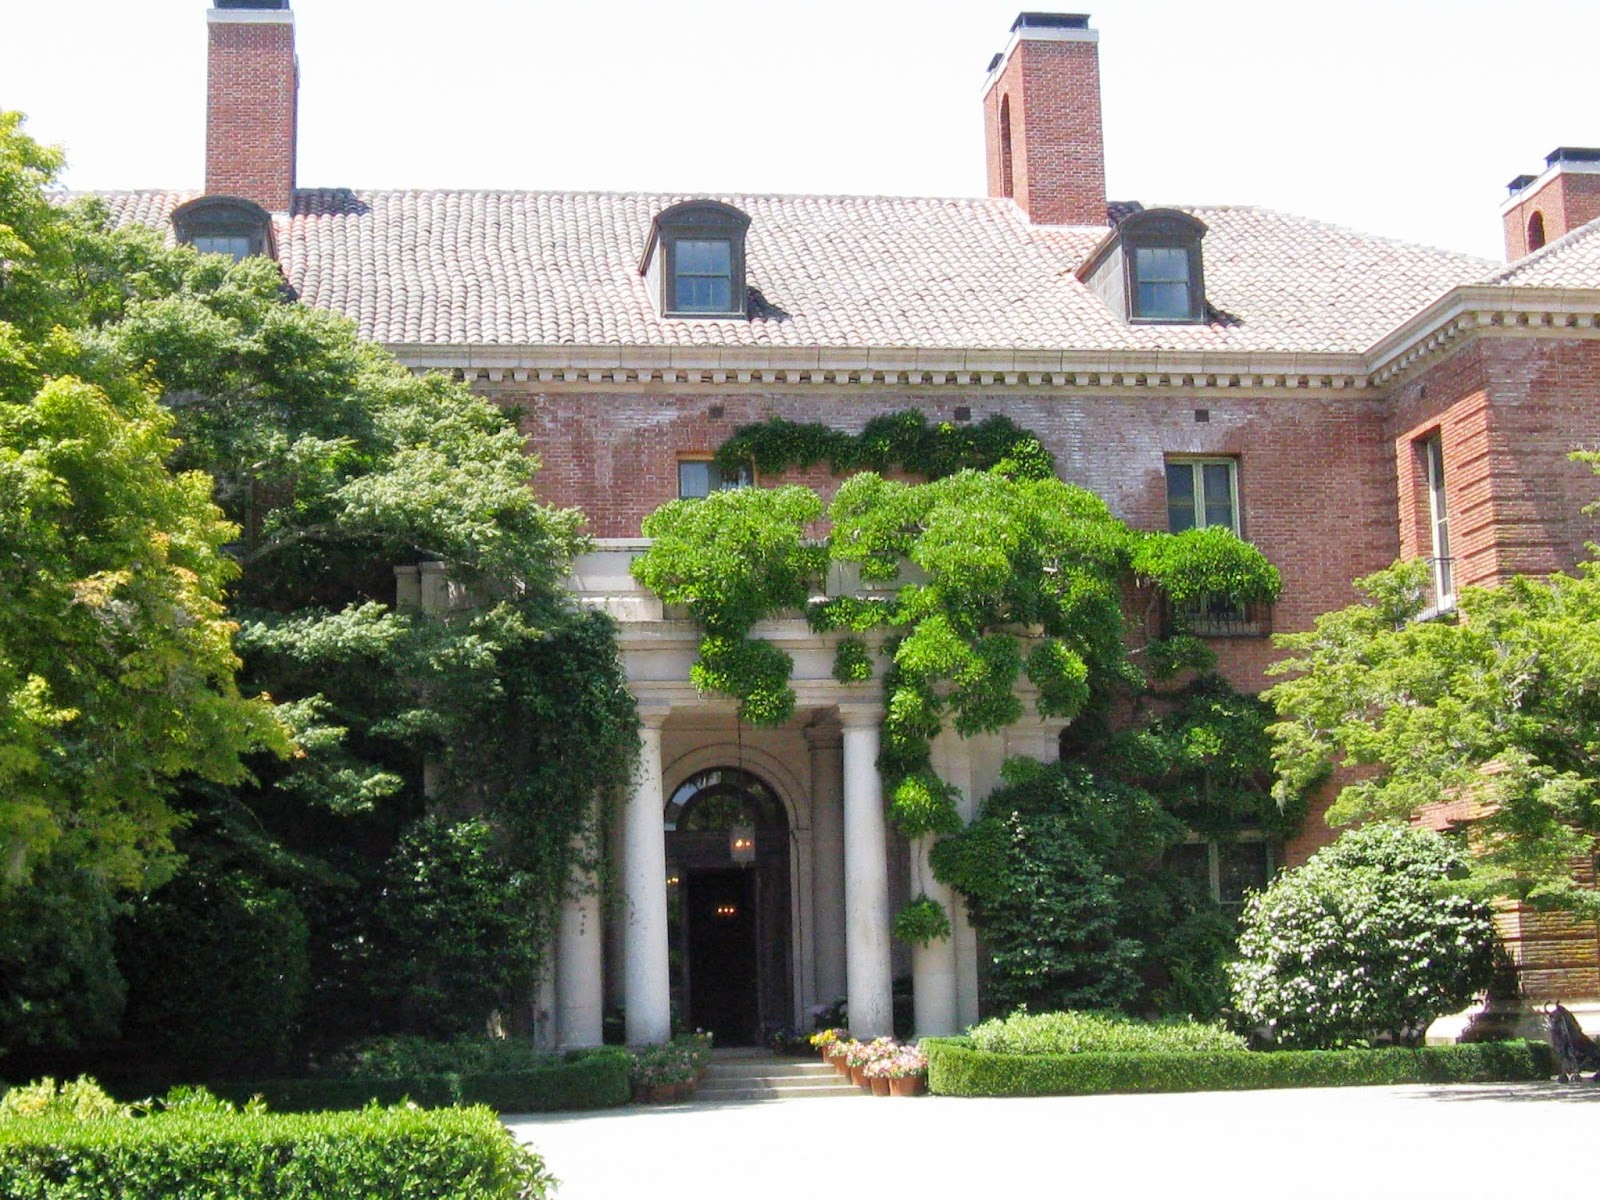 Fun tour guru goes off the beaten path filoli mansion for San francisco mansion tour